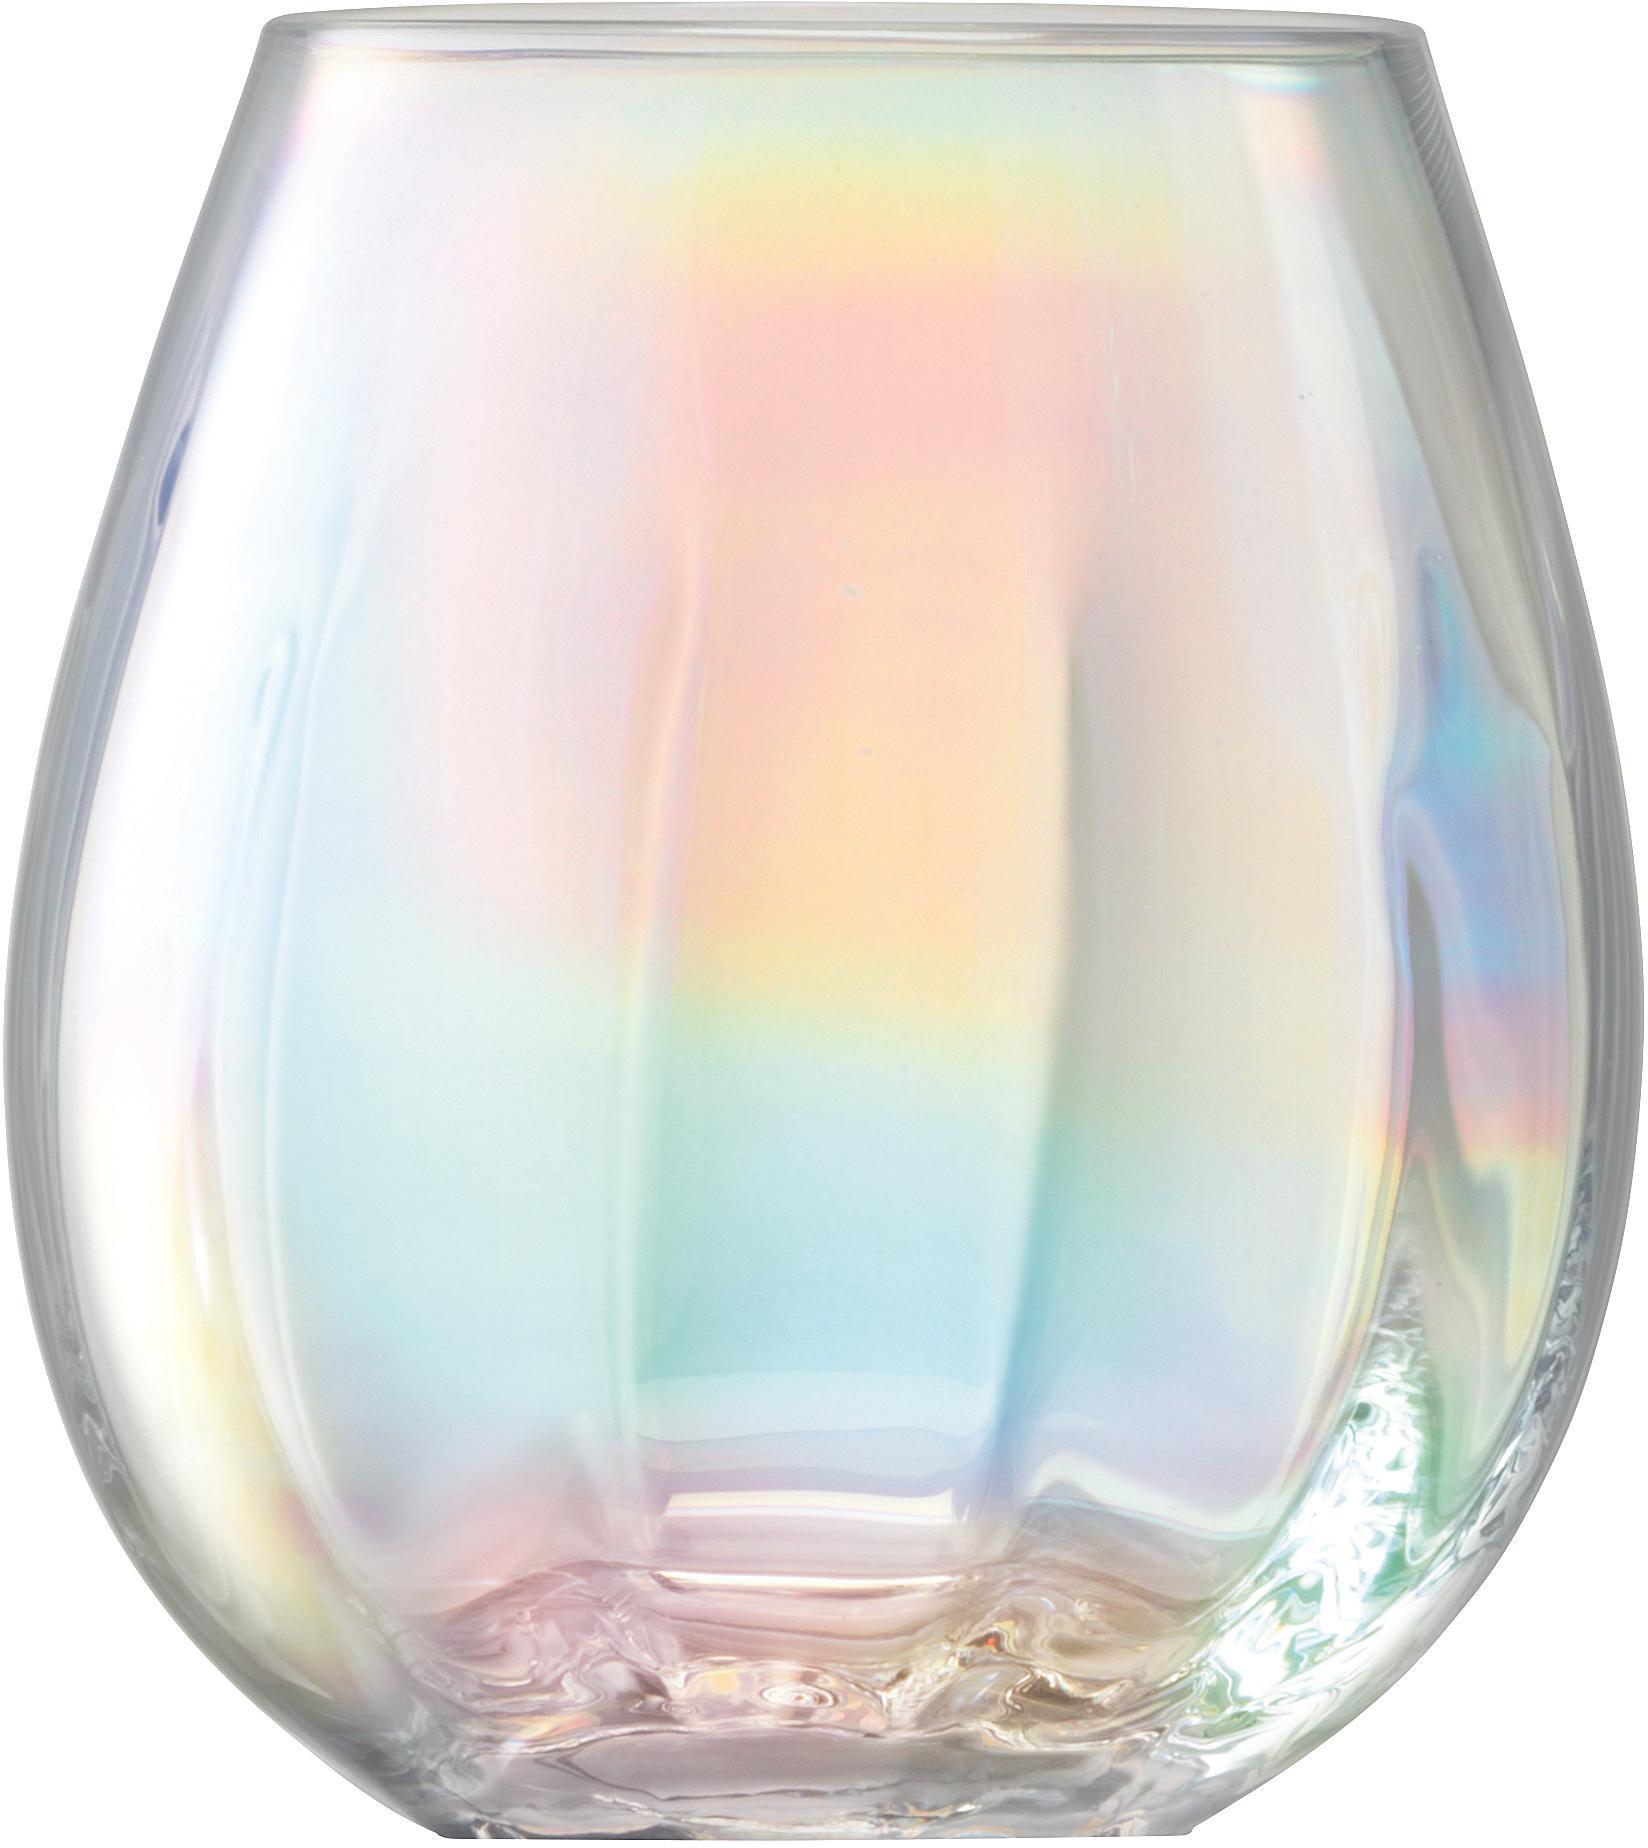 Bicchiere acqua in vetro soffiato Pearl 4 pz, Vetro, Riflessi madreperlacei, Ø 9 x Alt. 10 cm